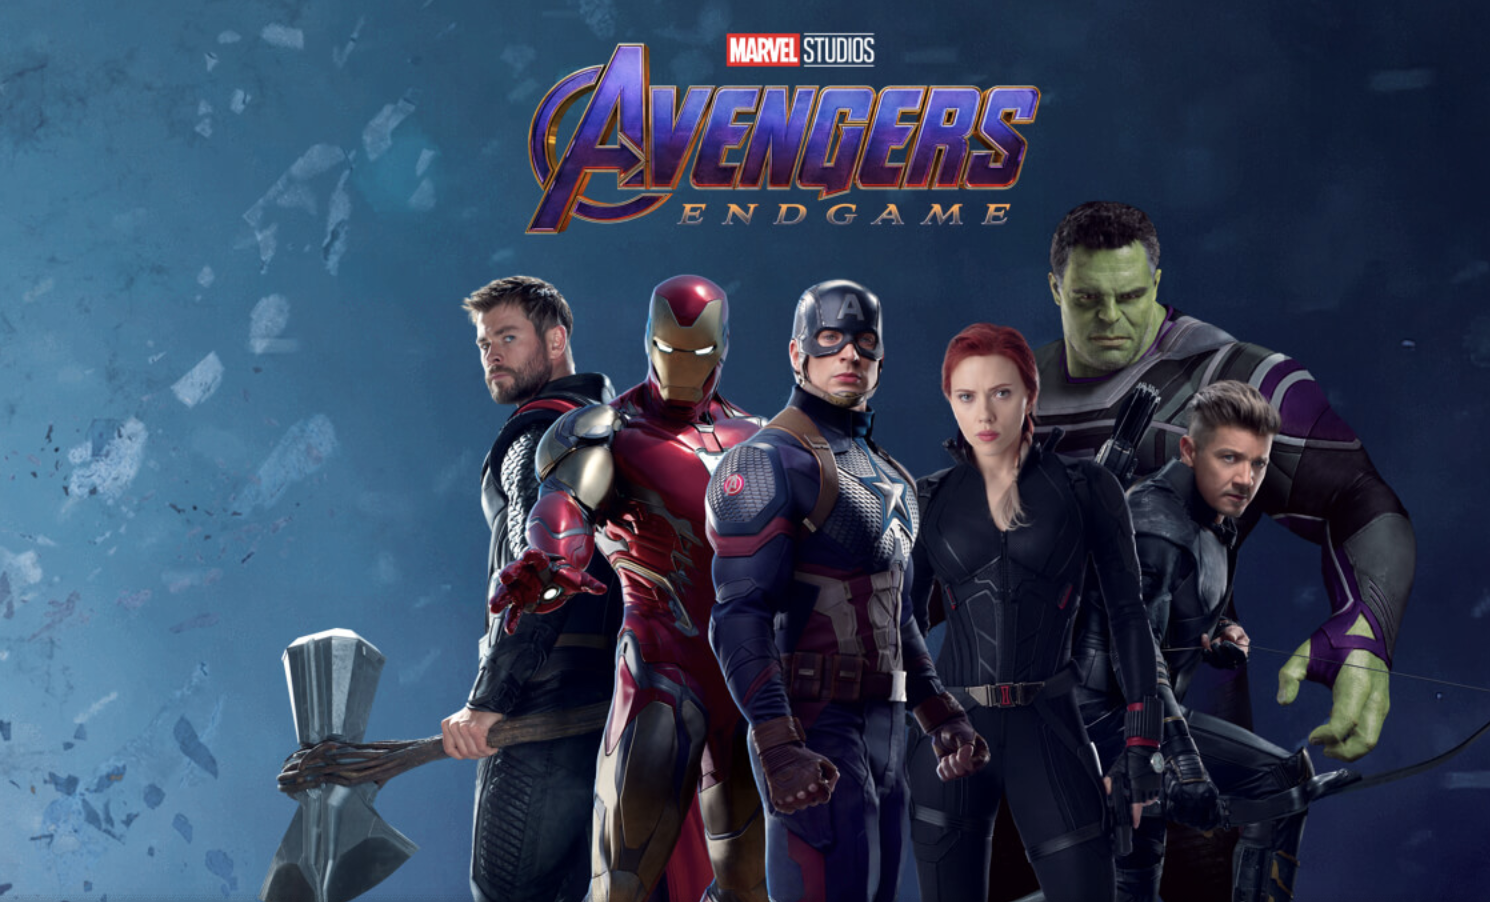 Imagen inédita de superheroínas en la batalla final de 'Avengers: Endgame' incluida ¿Black Widow?